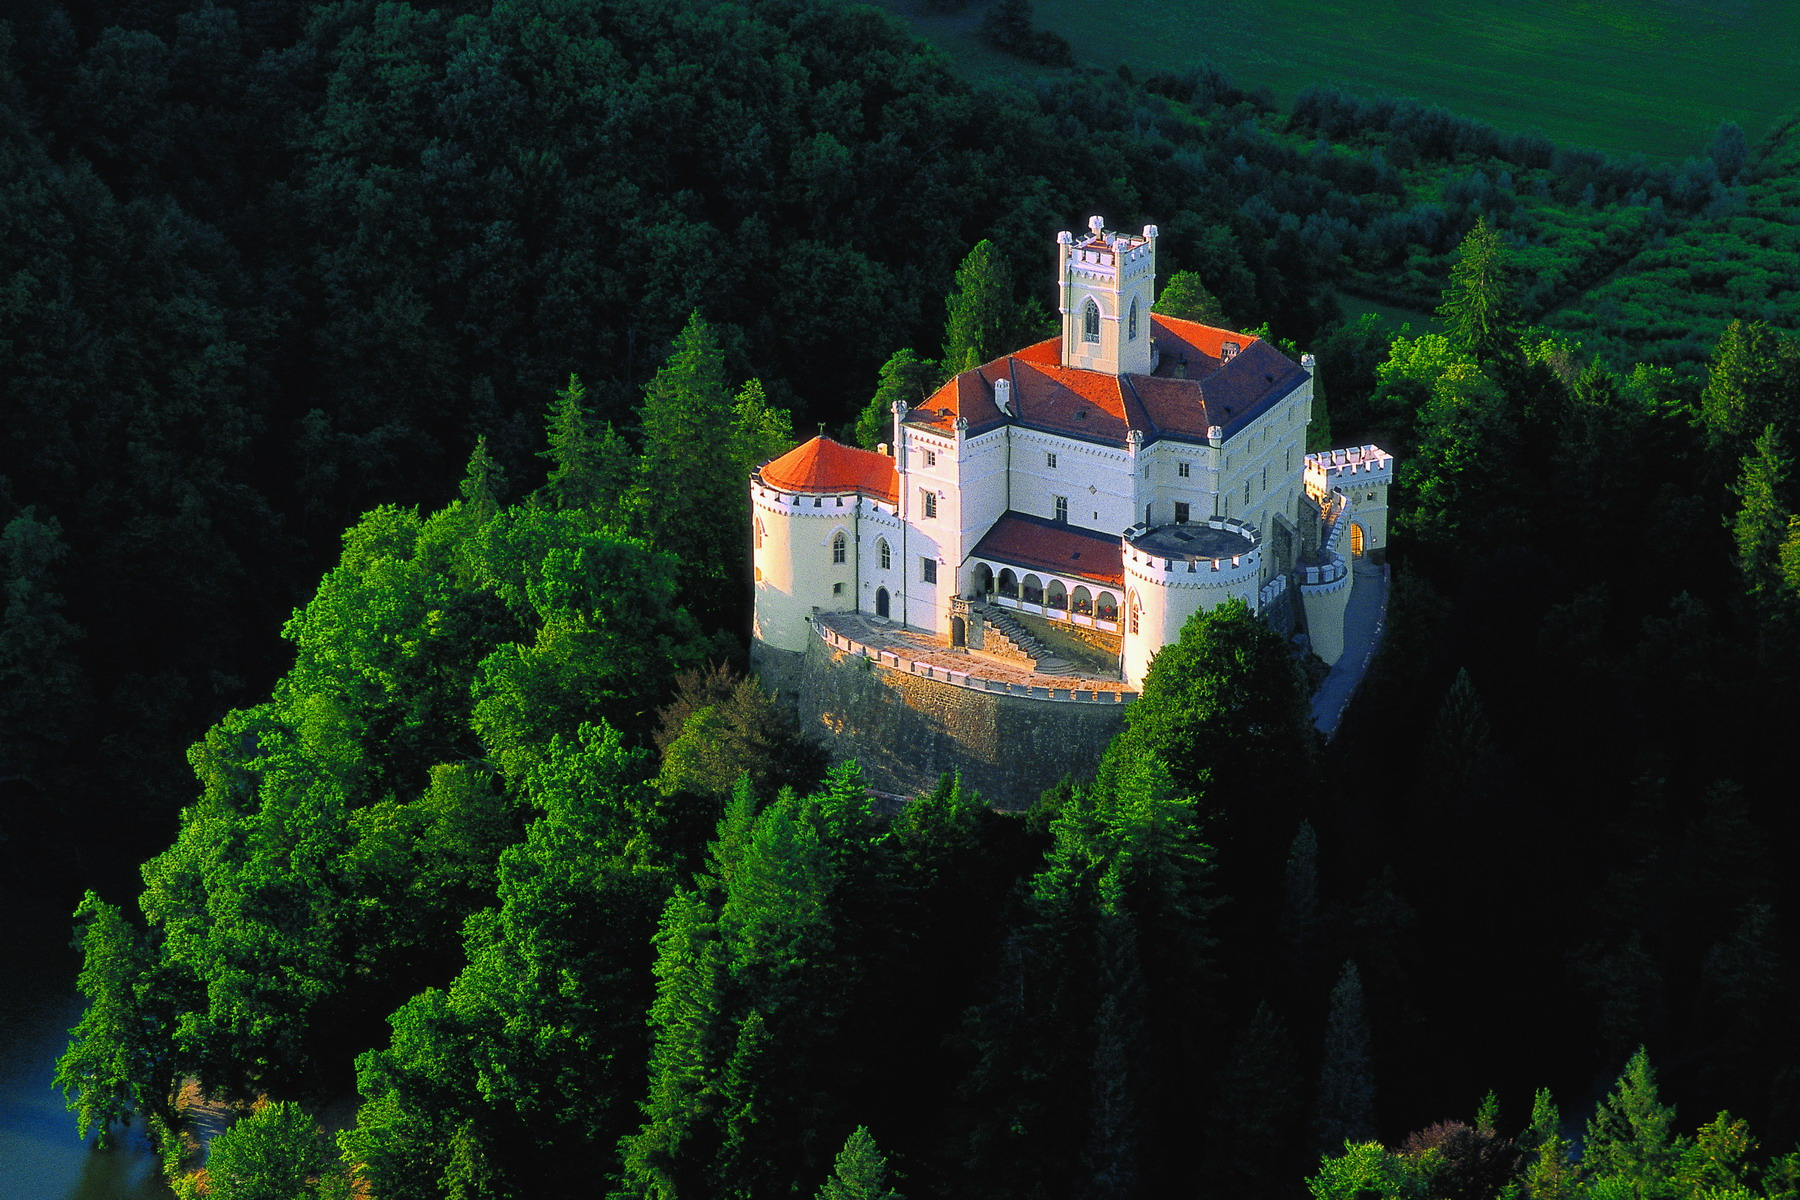 TRAKOŠĆAN CASTLE AND RAVNA GORA